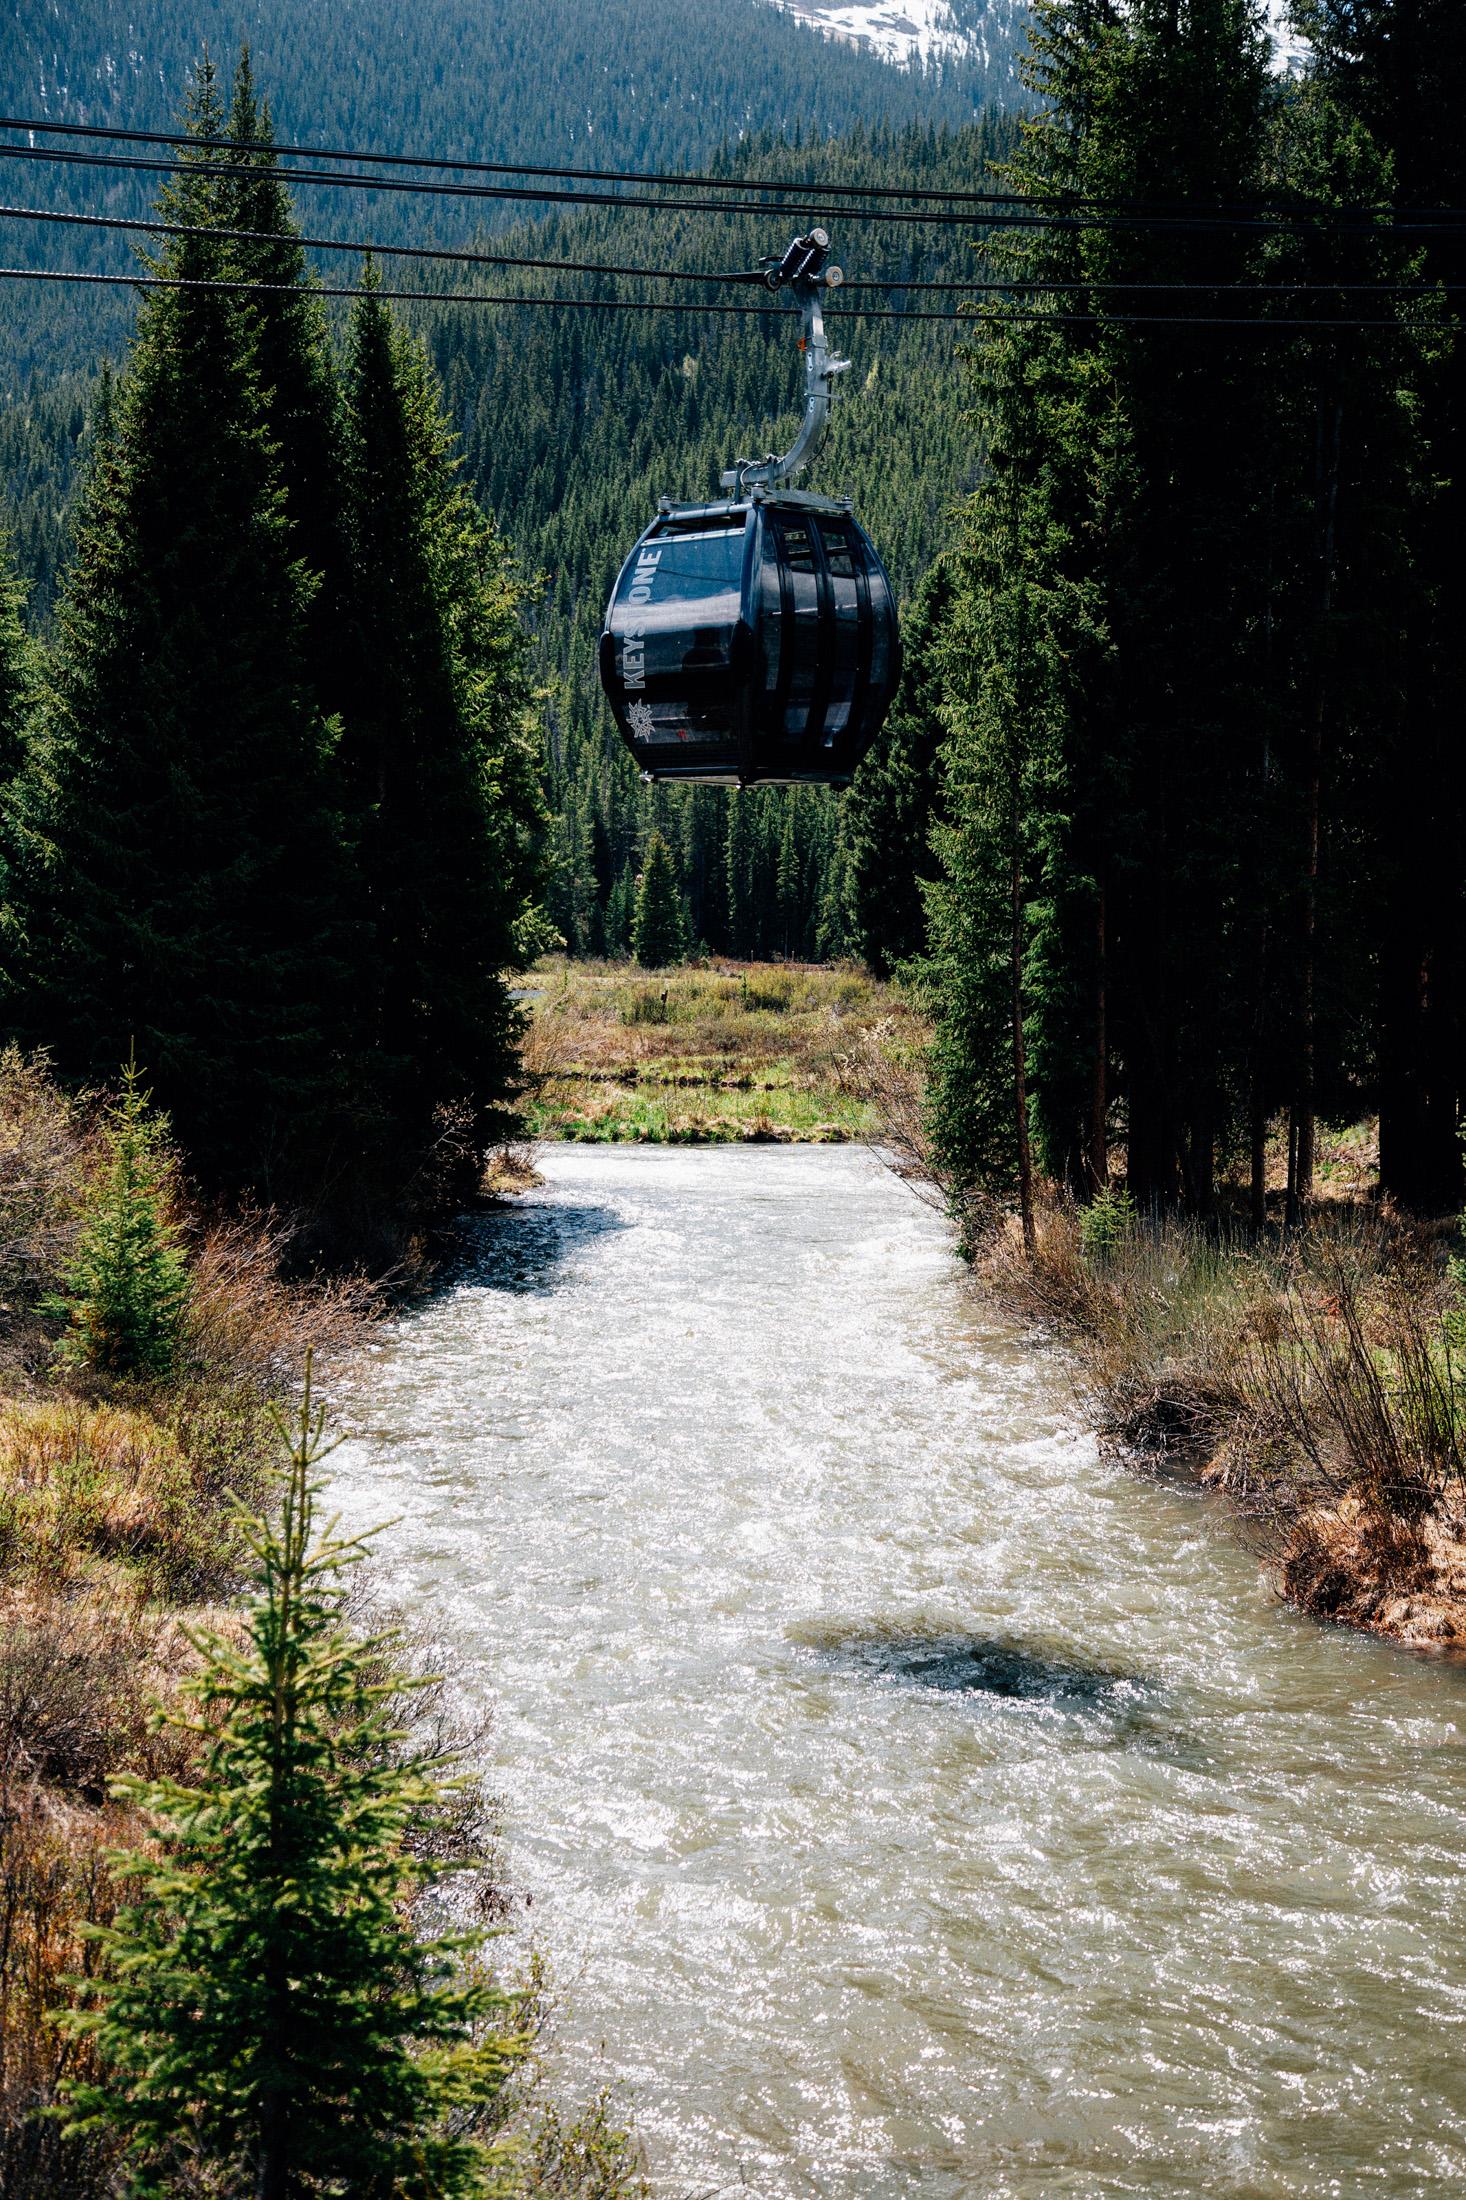 Gondola over the creek at Center Village.